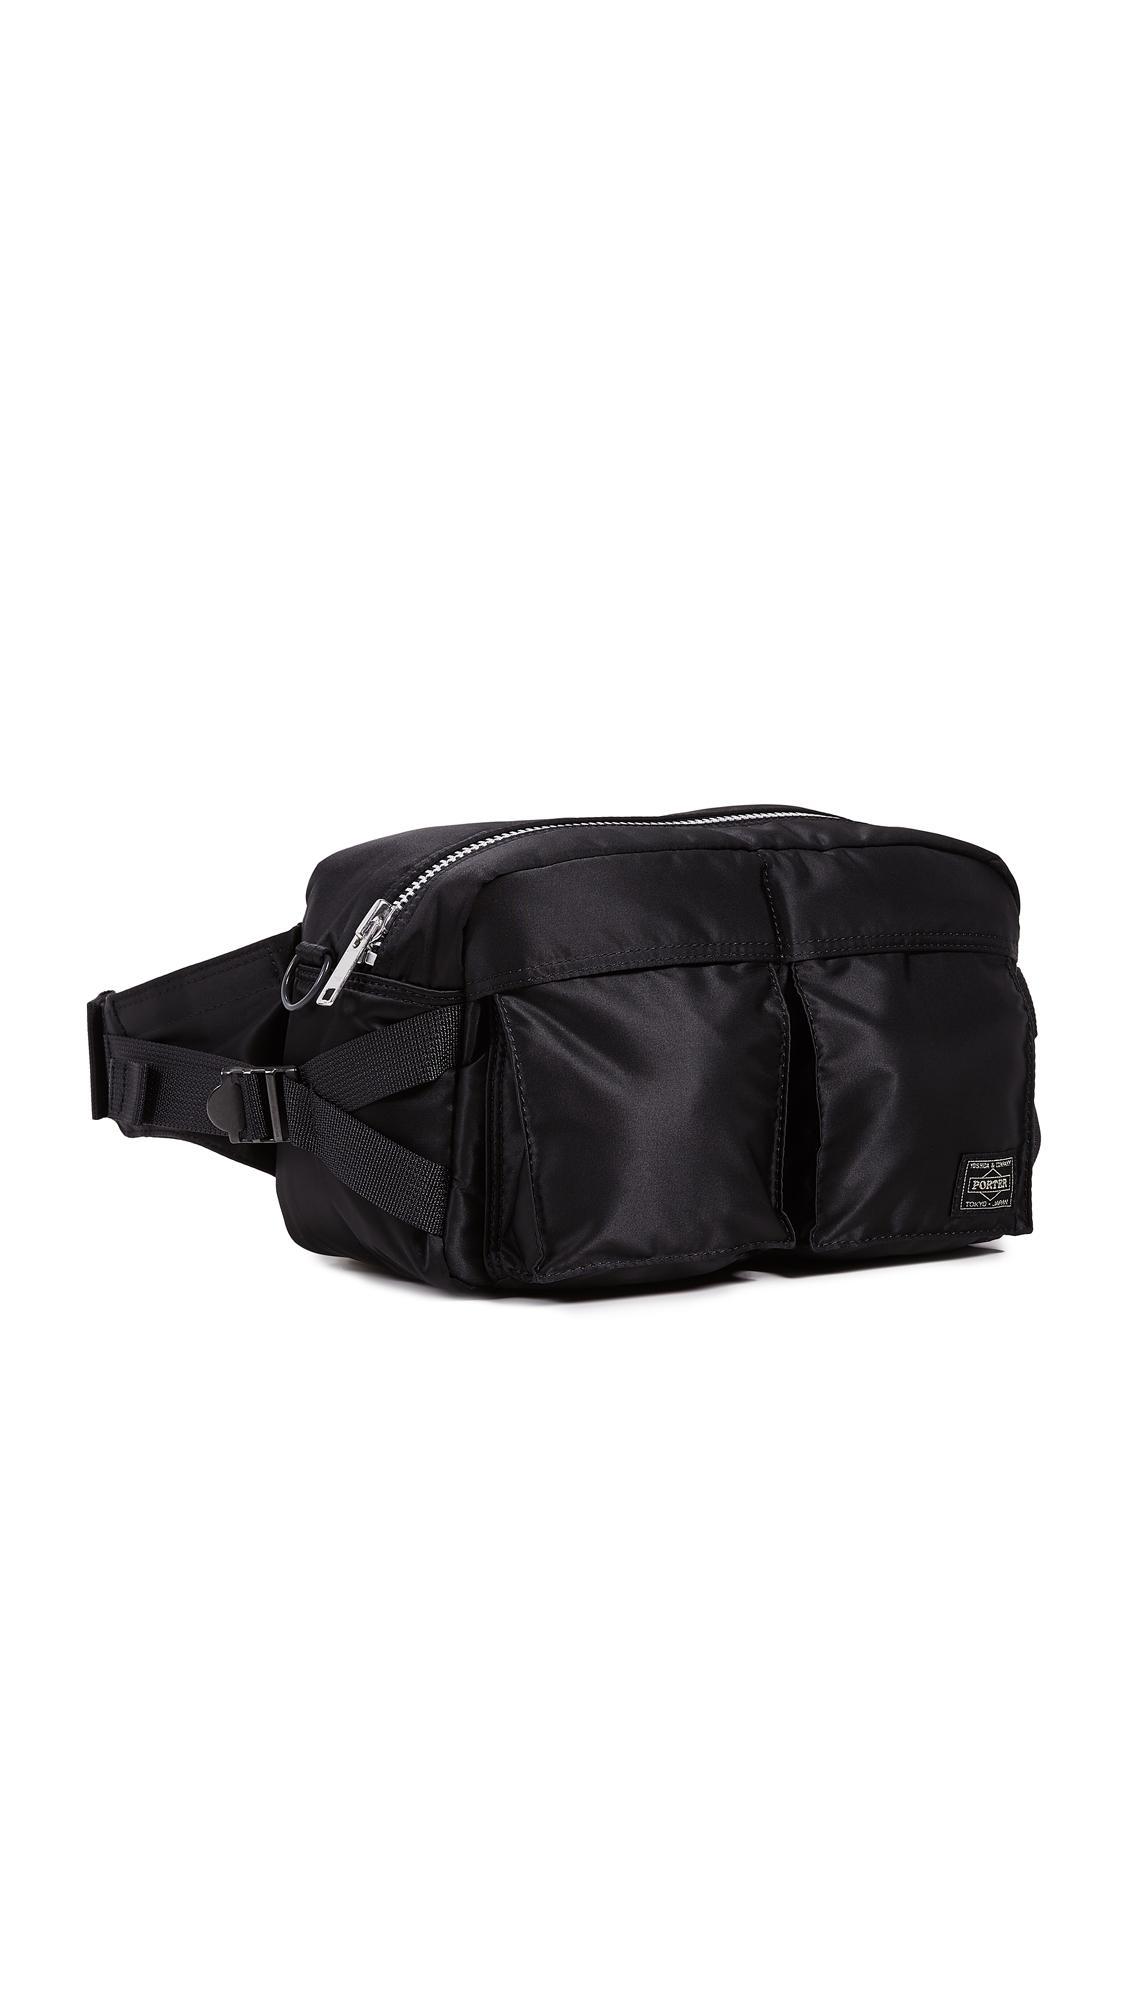 PORTER Tanker Waist Bag L in Black